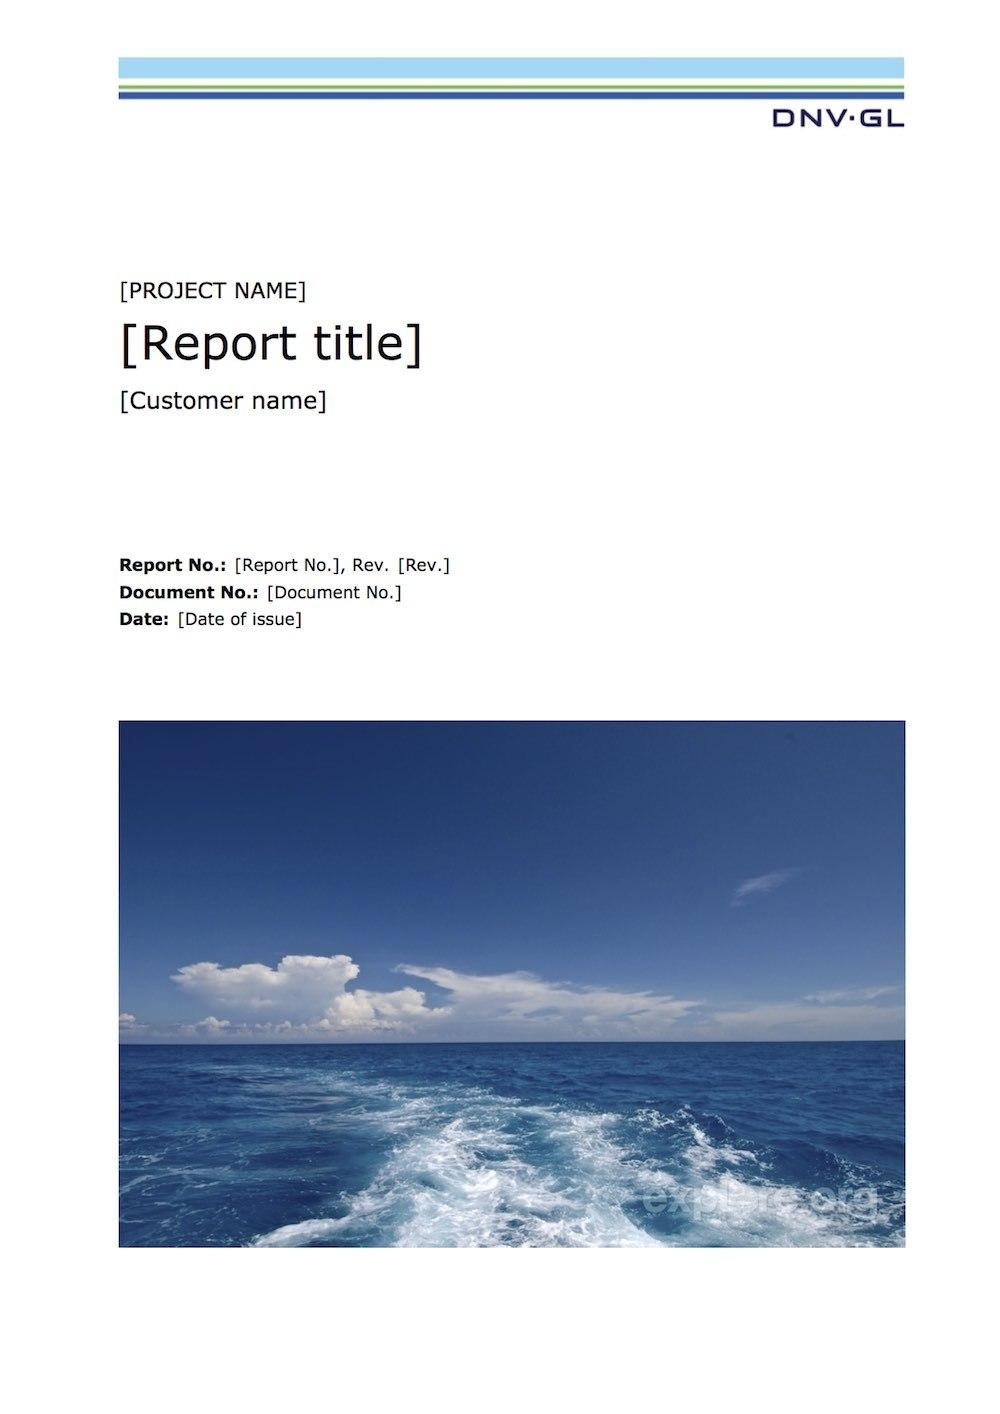 Latex Typesetting  Showcase Regarding Project Report Latex Template